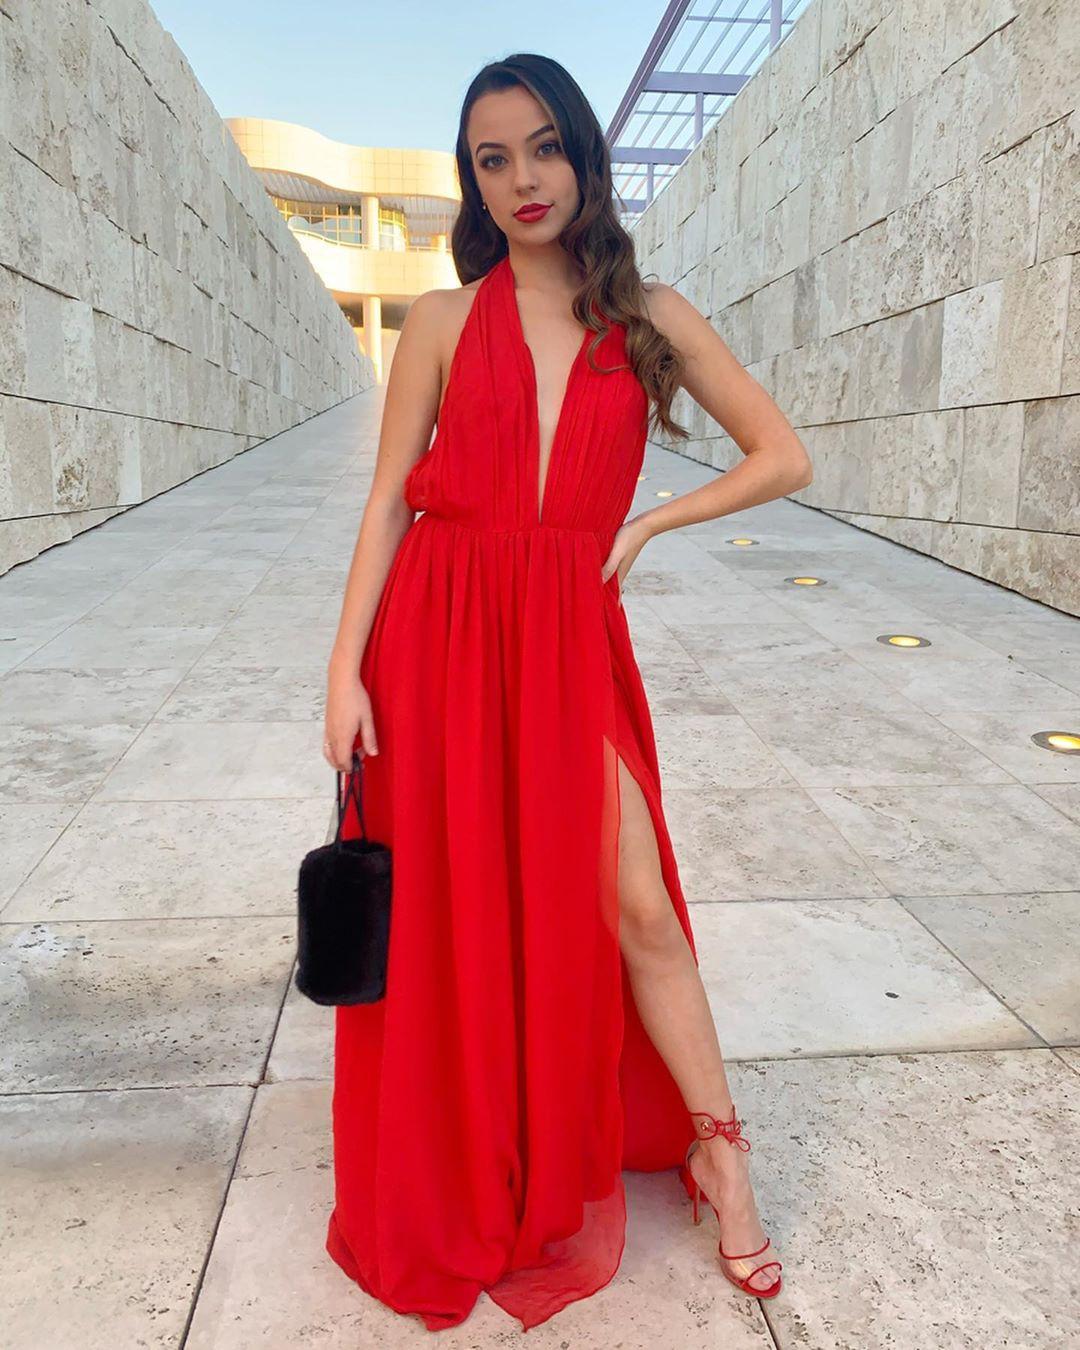 Vanessa Merrell dress formal wear outfit pinterest, fashion photoshoot